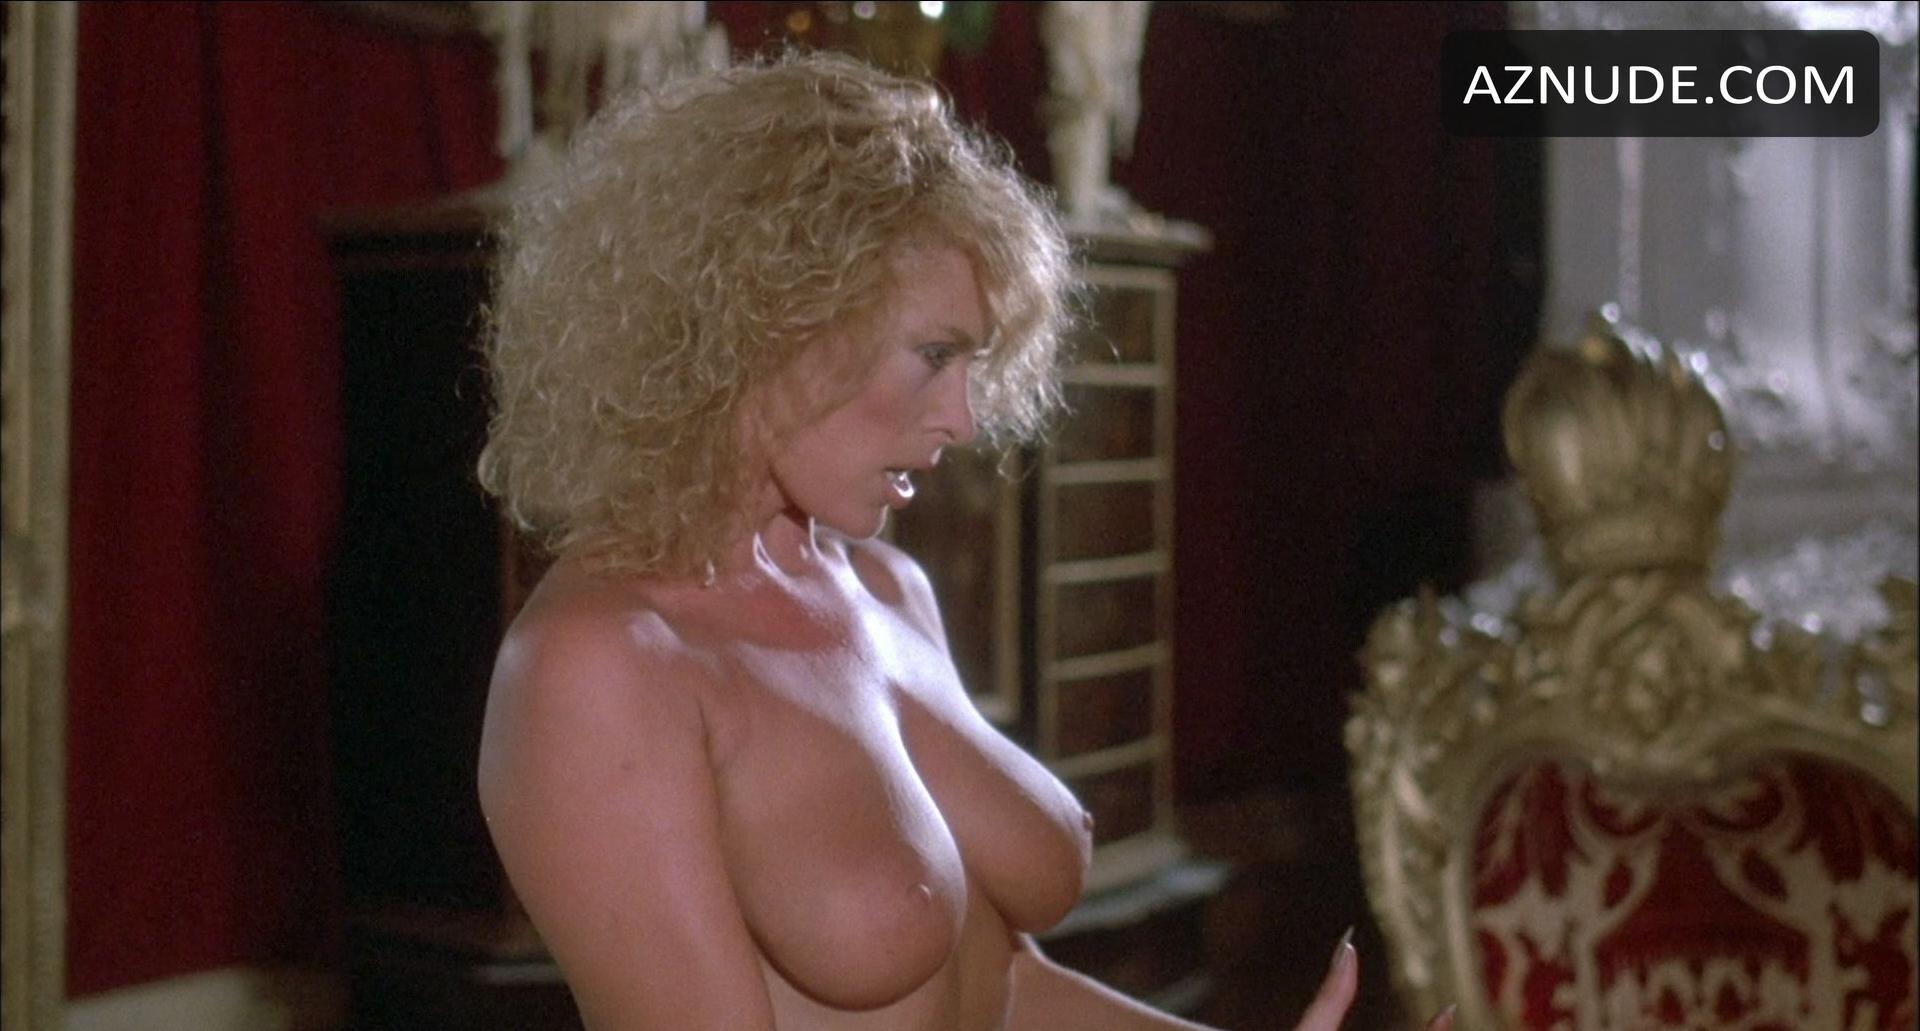 Eva lare fake nude